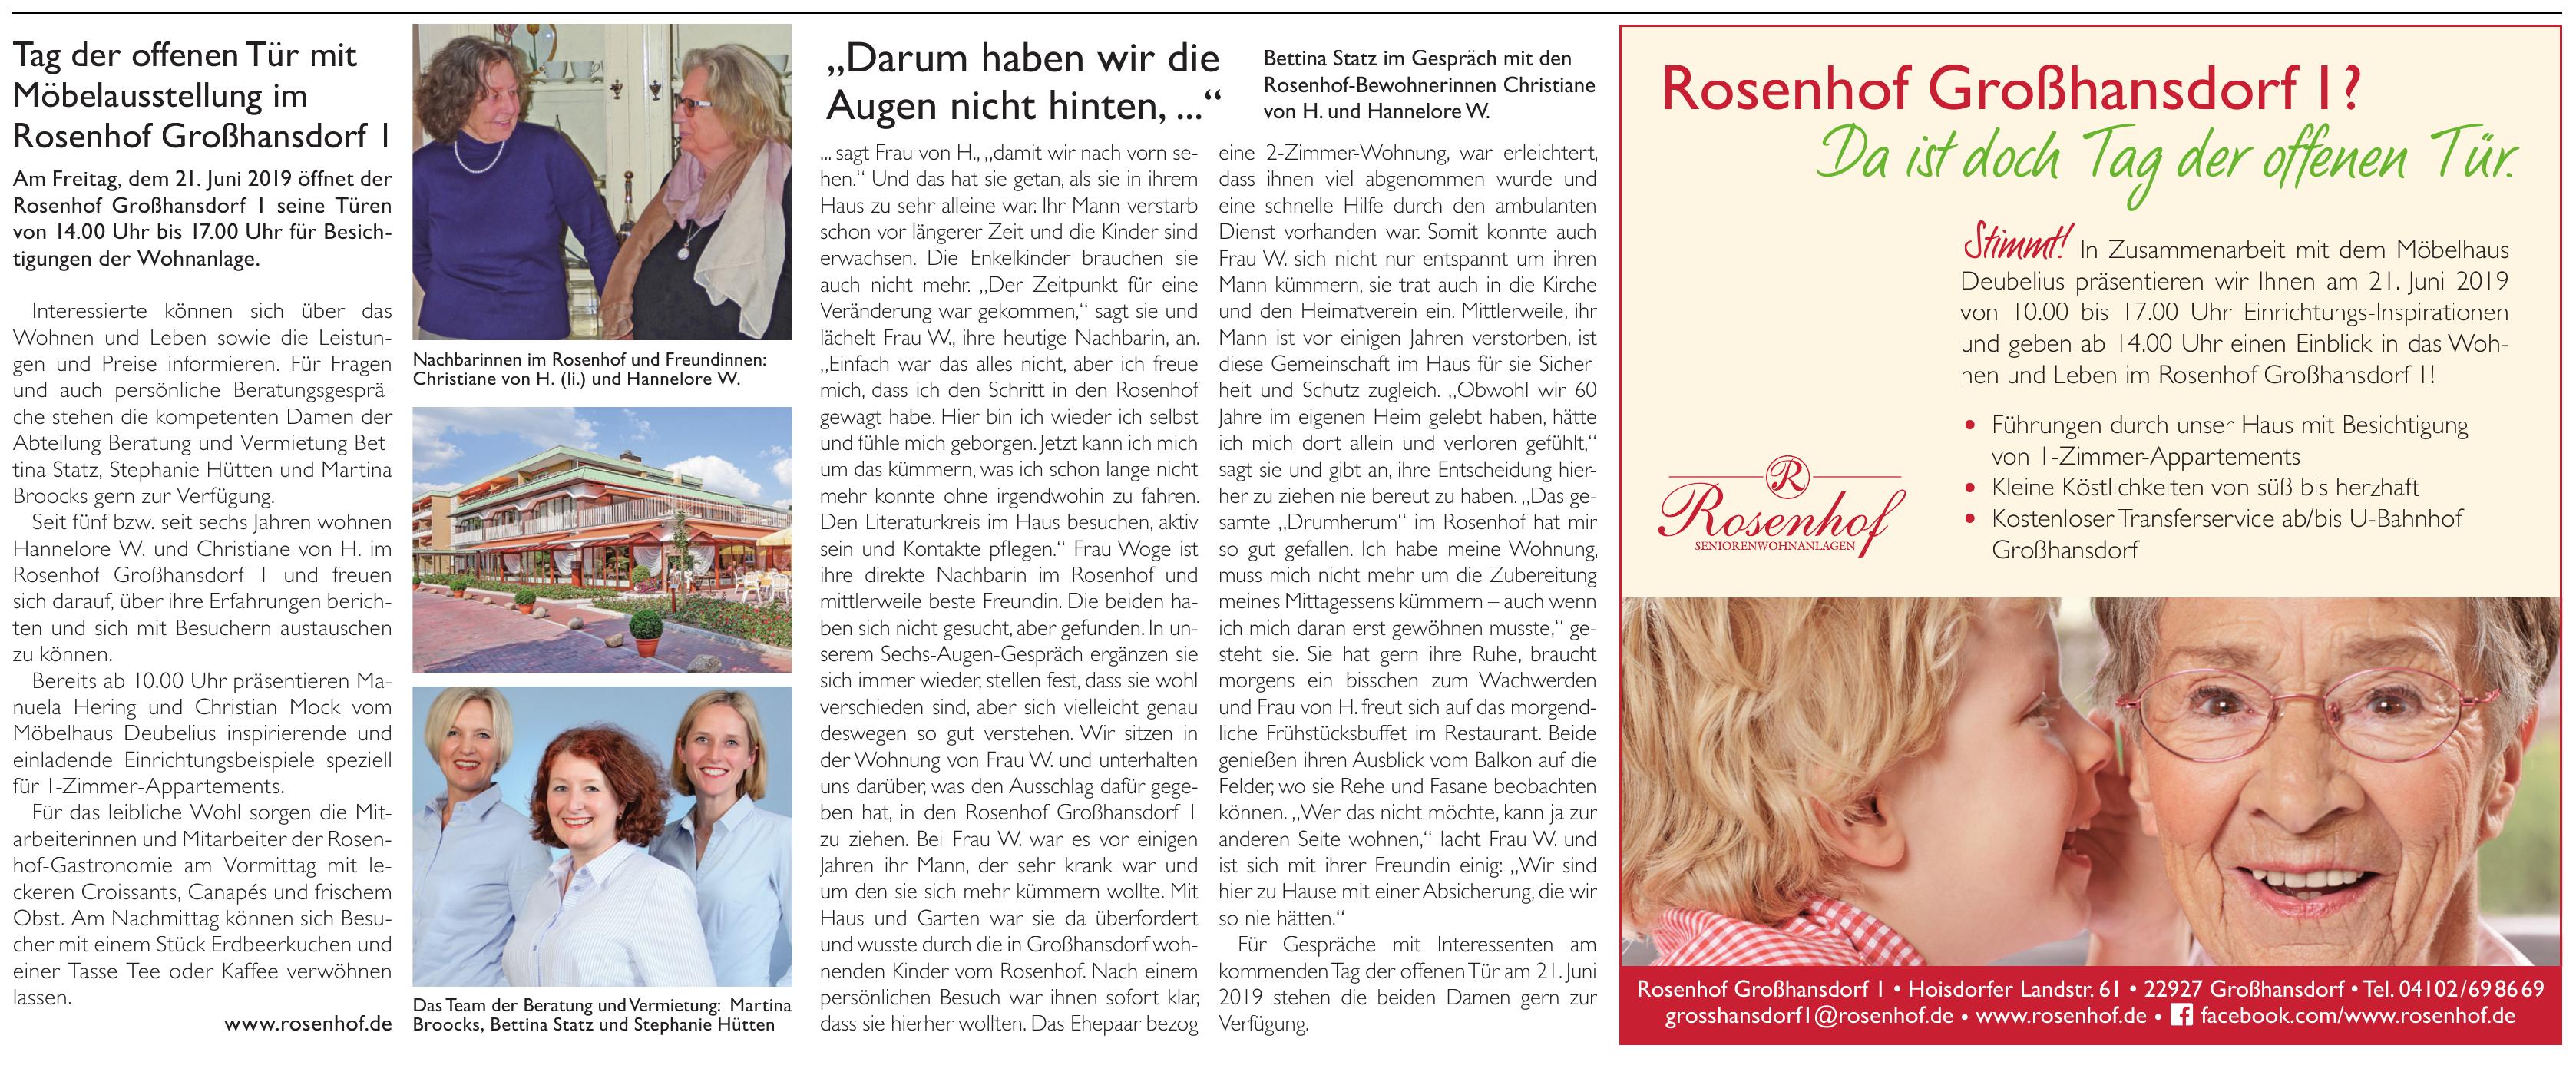 Rosenhof Großhansdorf 1